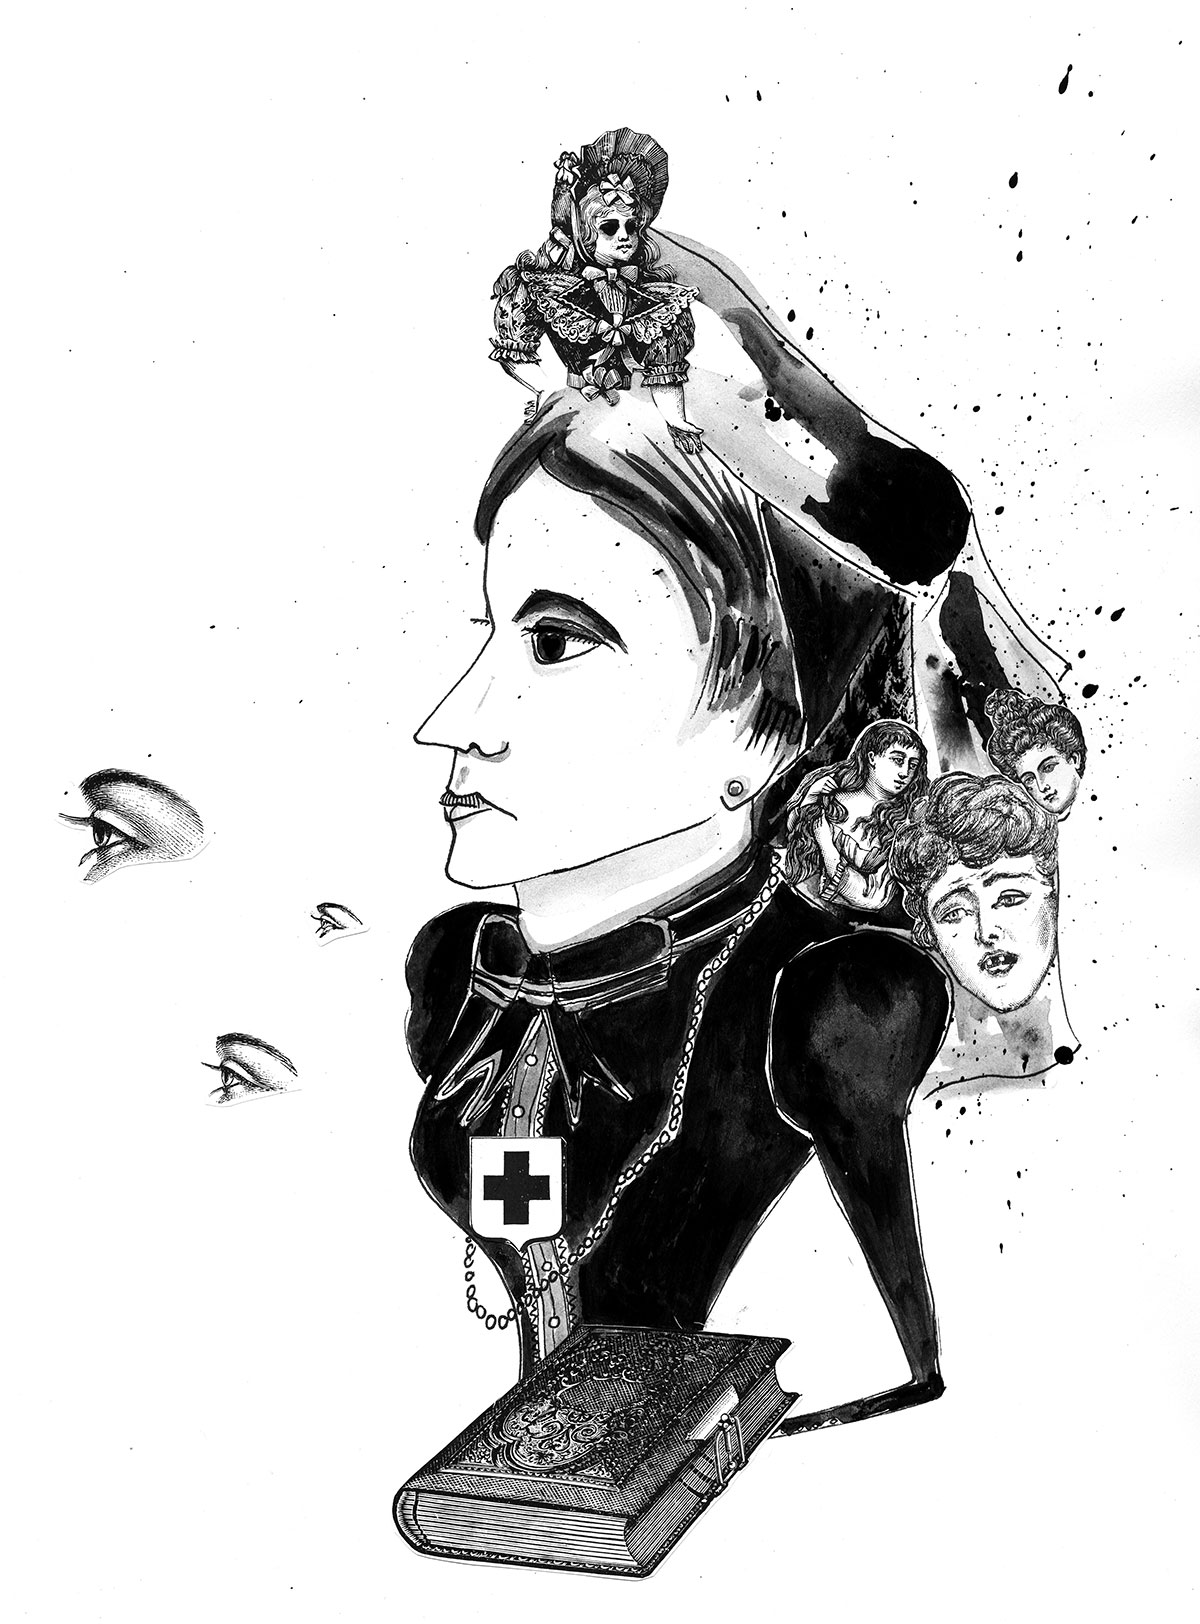 Art by Kristi-Ly Green